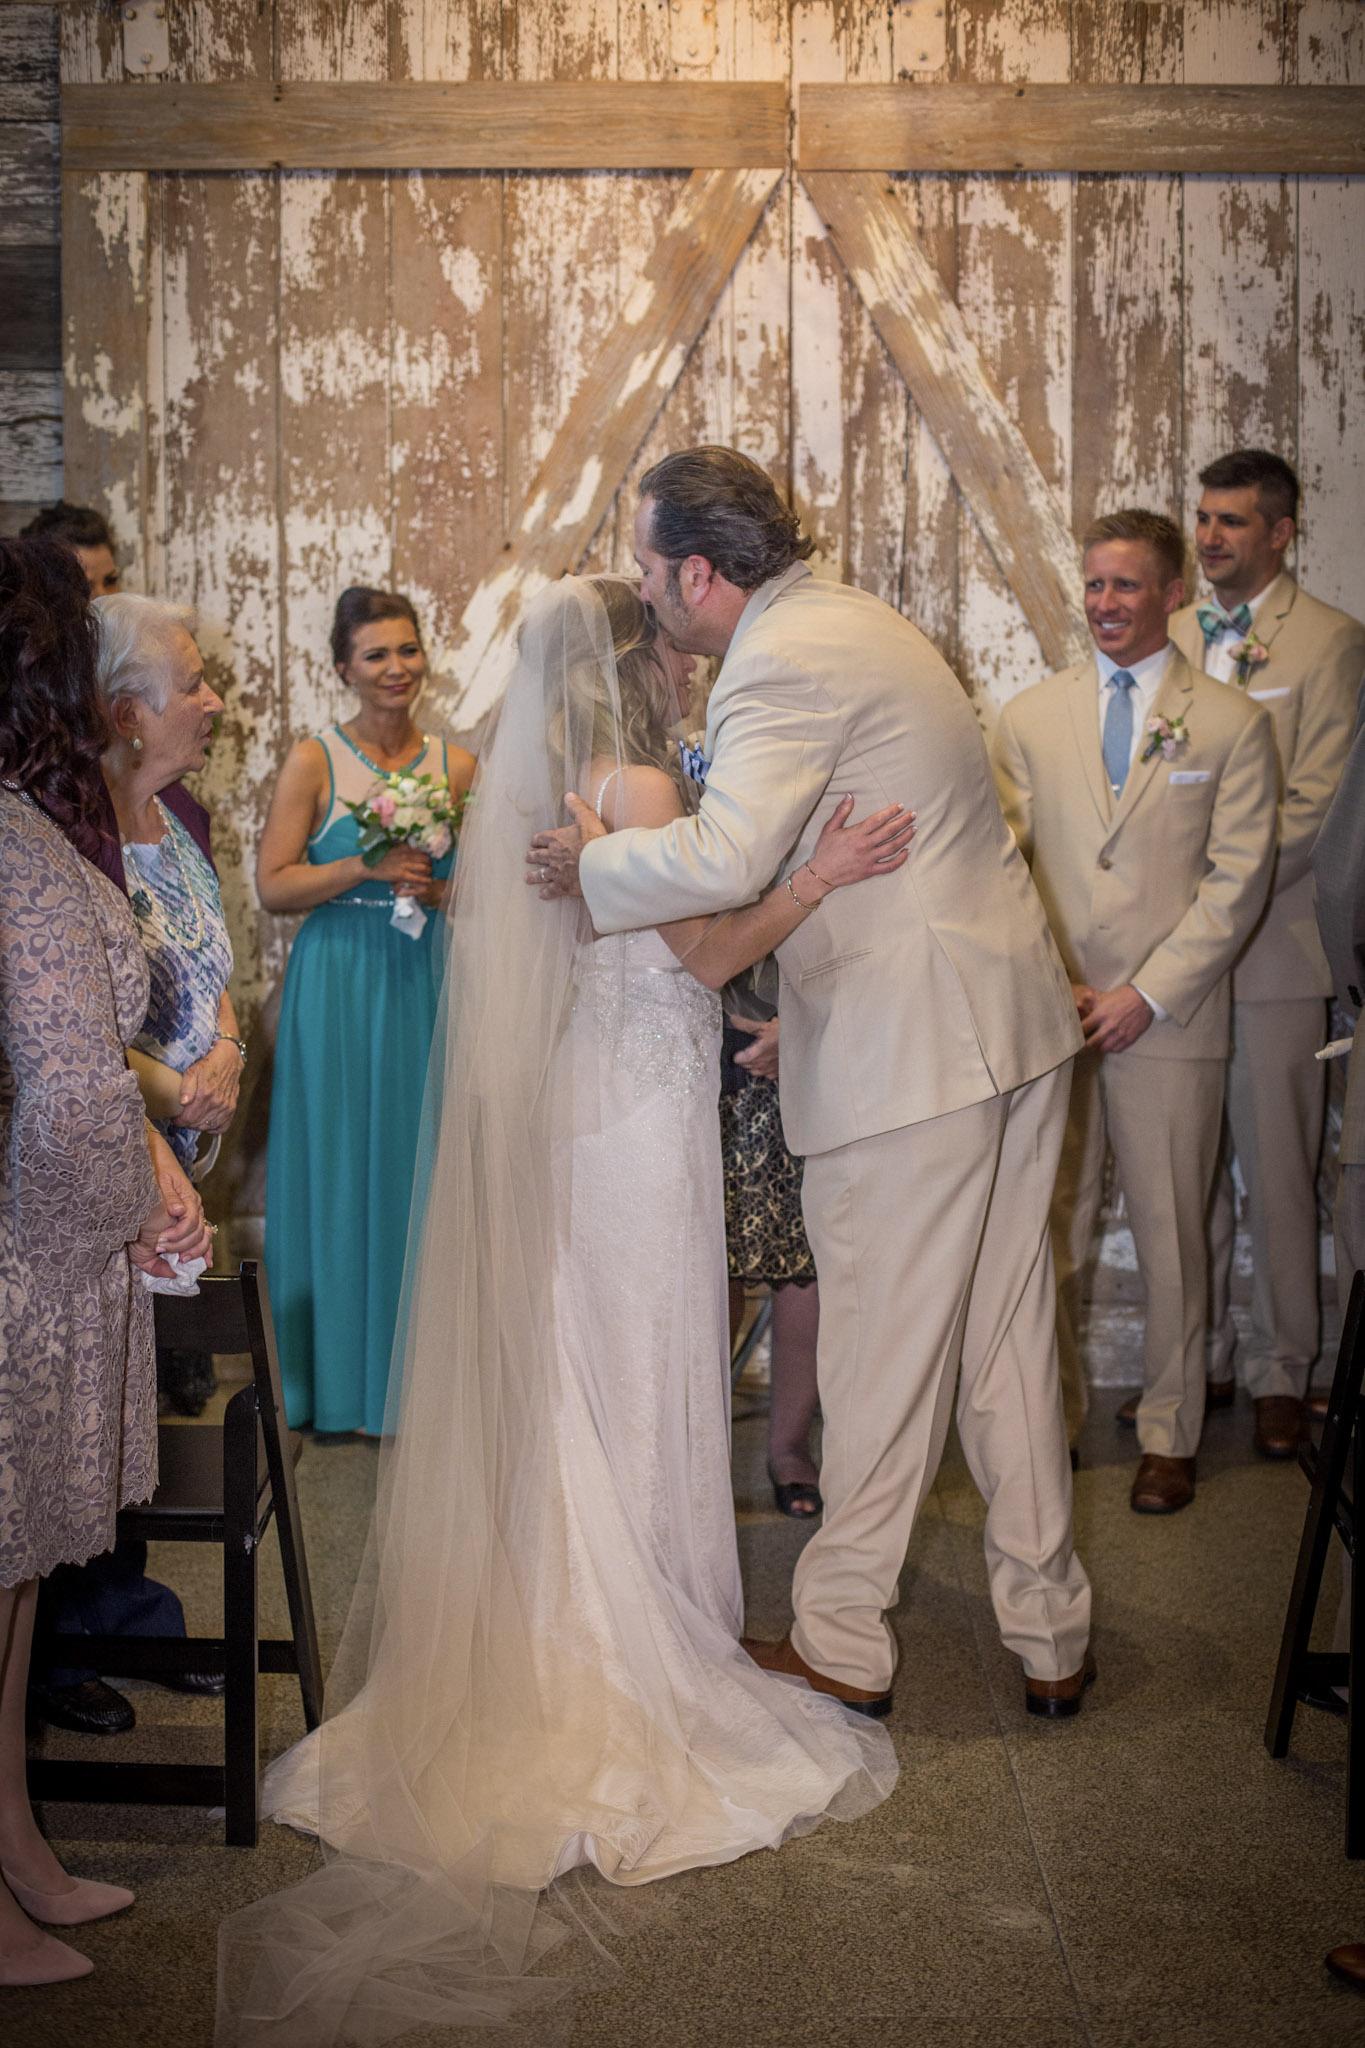 Kansas_City_Small_Wedding_Venue_Elope_Intimate_Ceremony_Budget_Affordable_Megan & Jeff-087.jpg